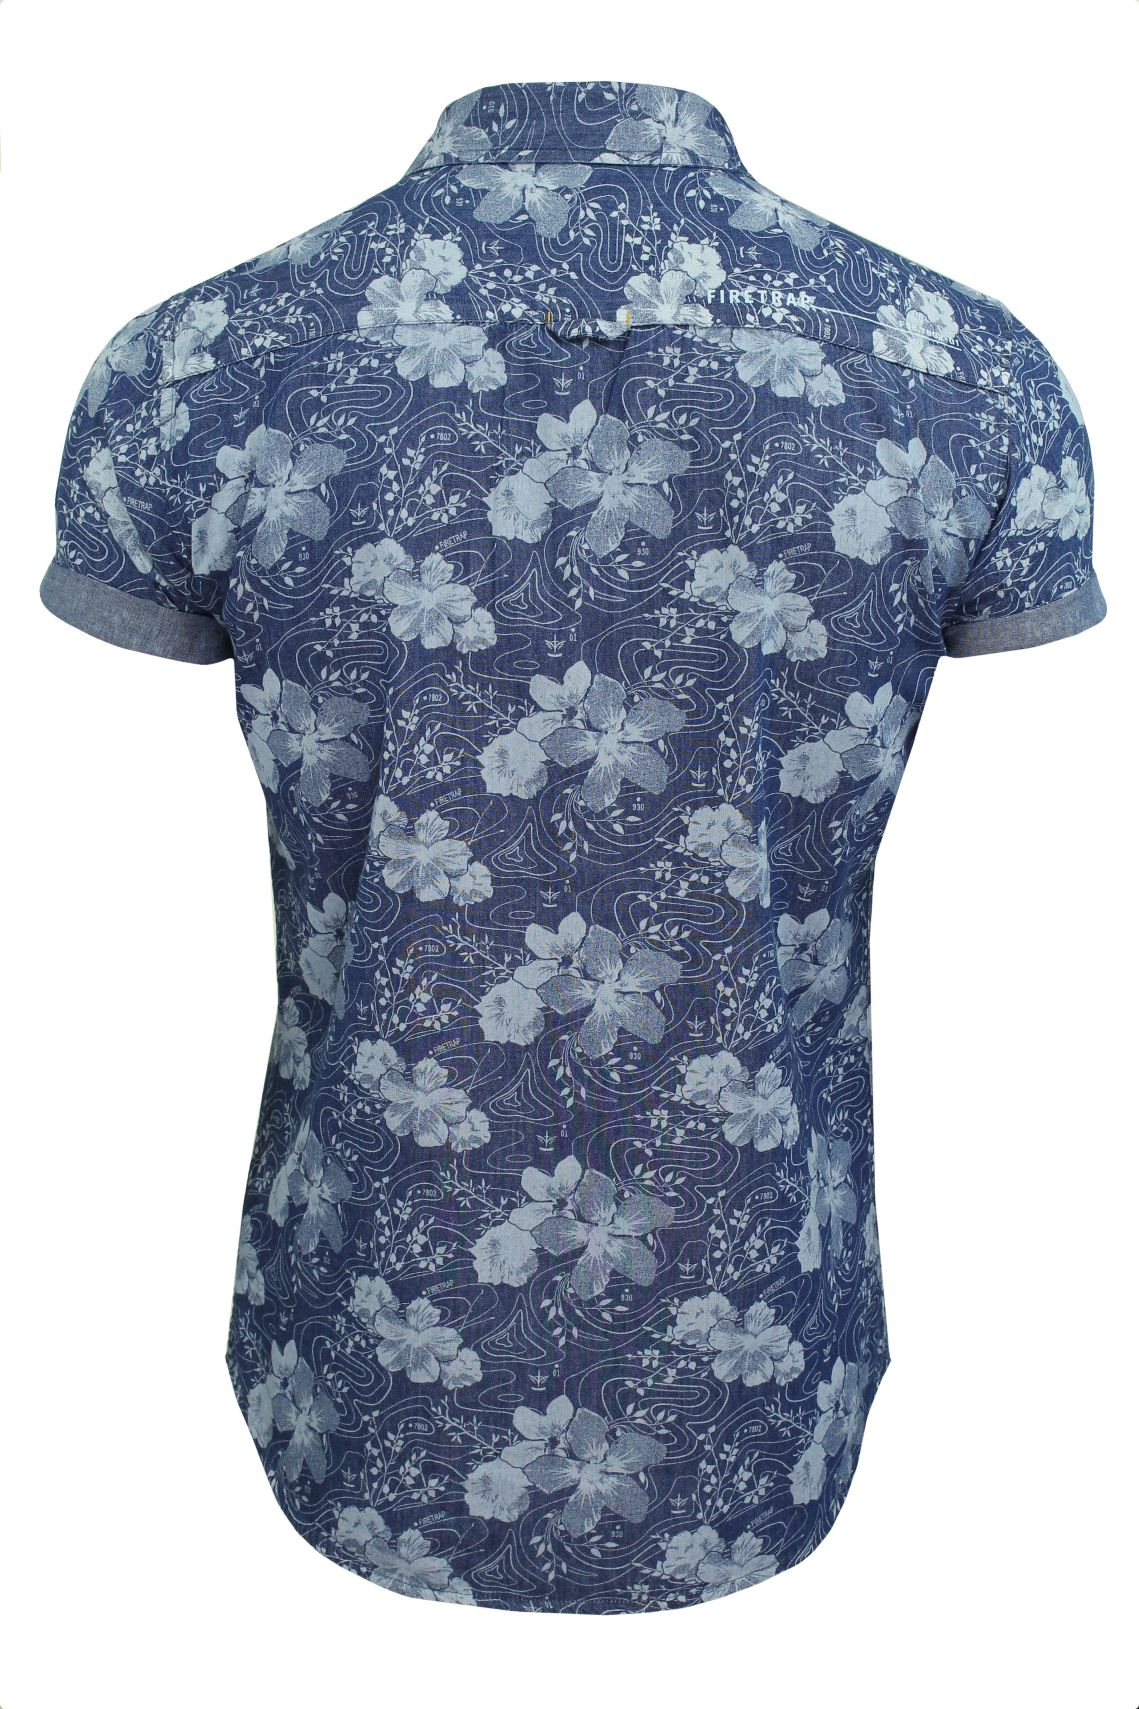 Mens-Short-Sleeved-Shirt-by-Firetrap thumbnail 32